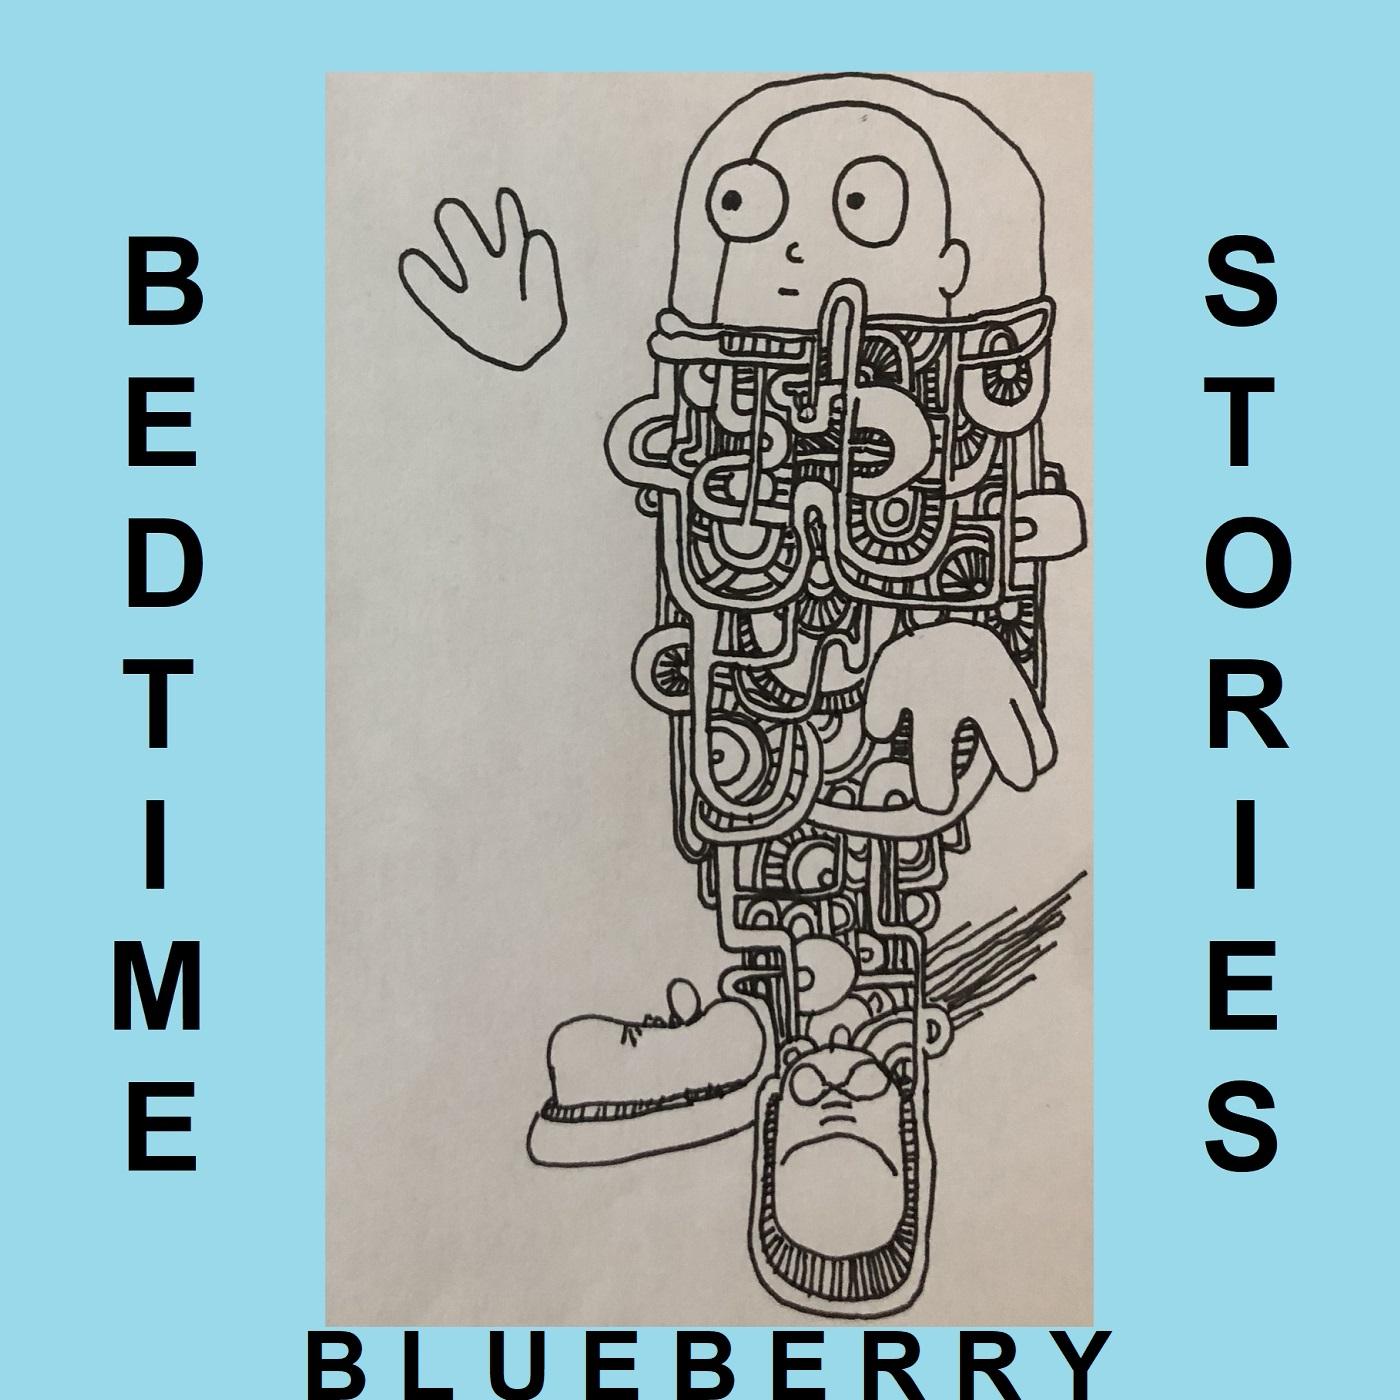 Bedtime Blueberry